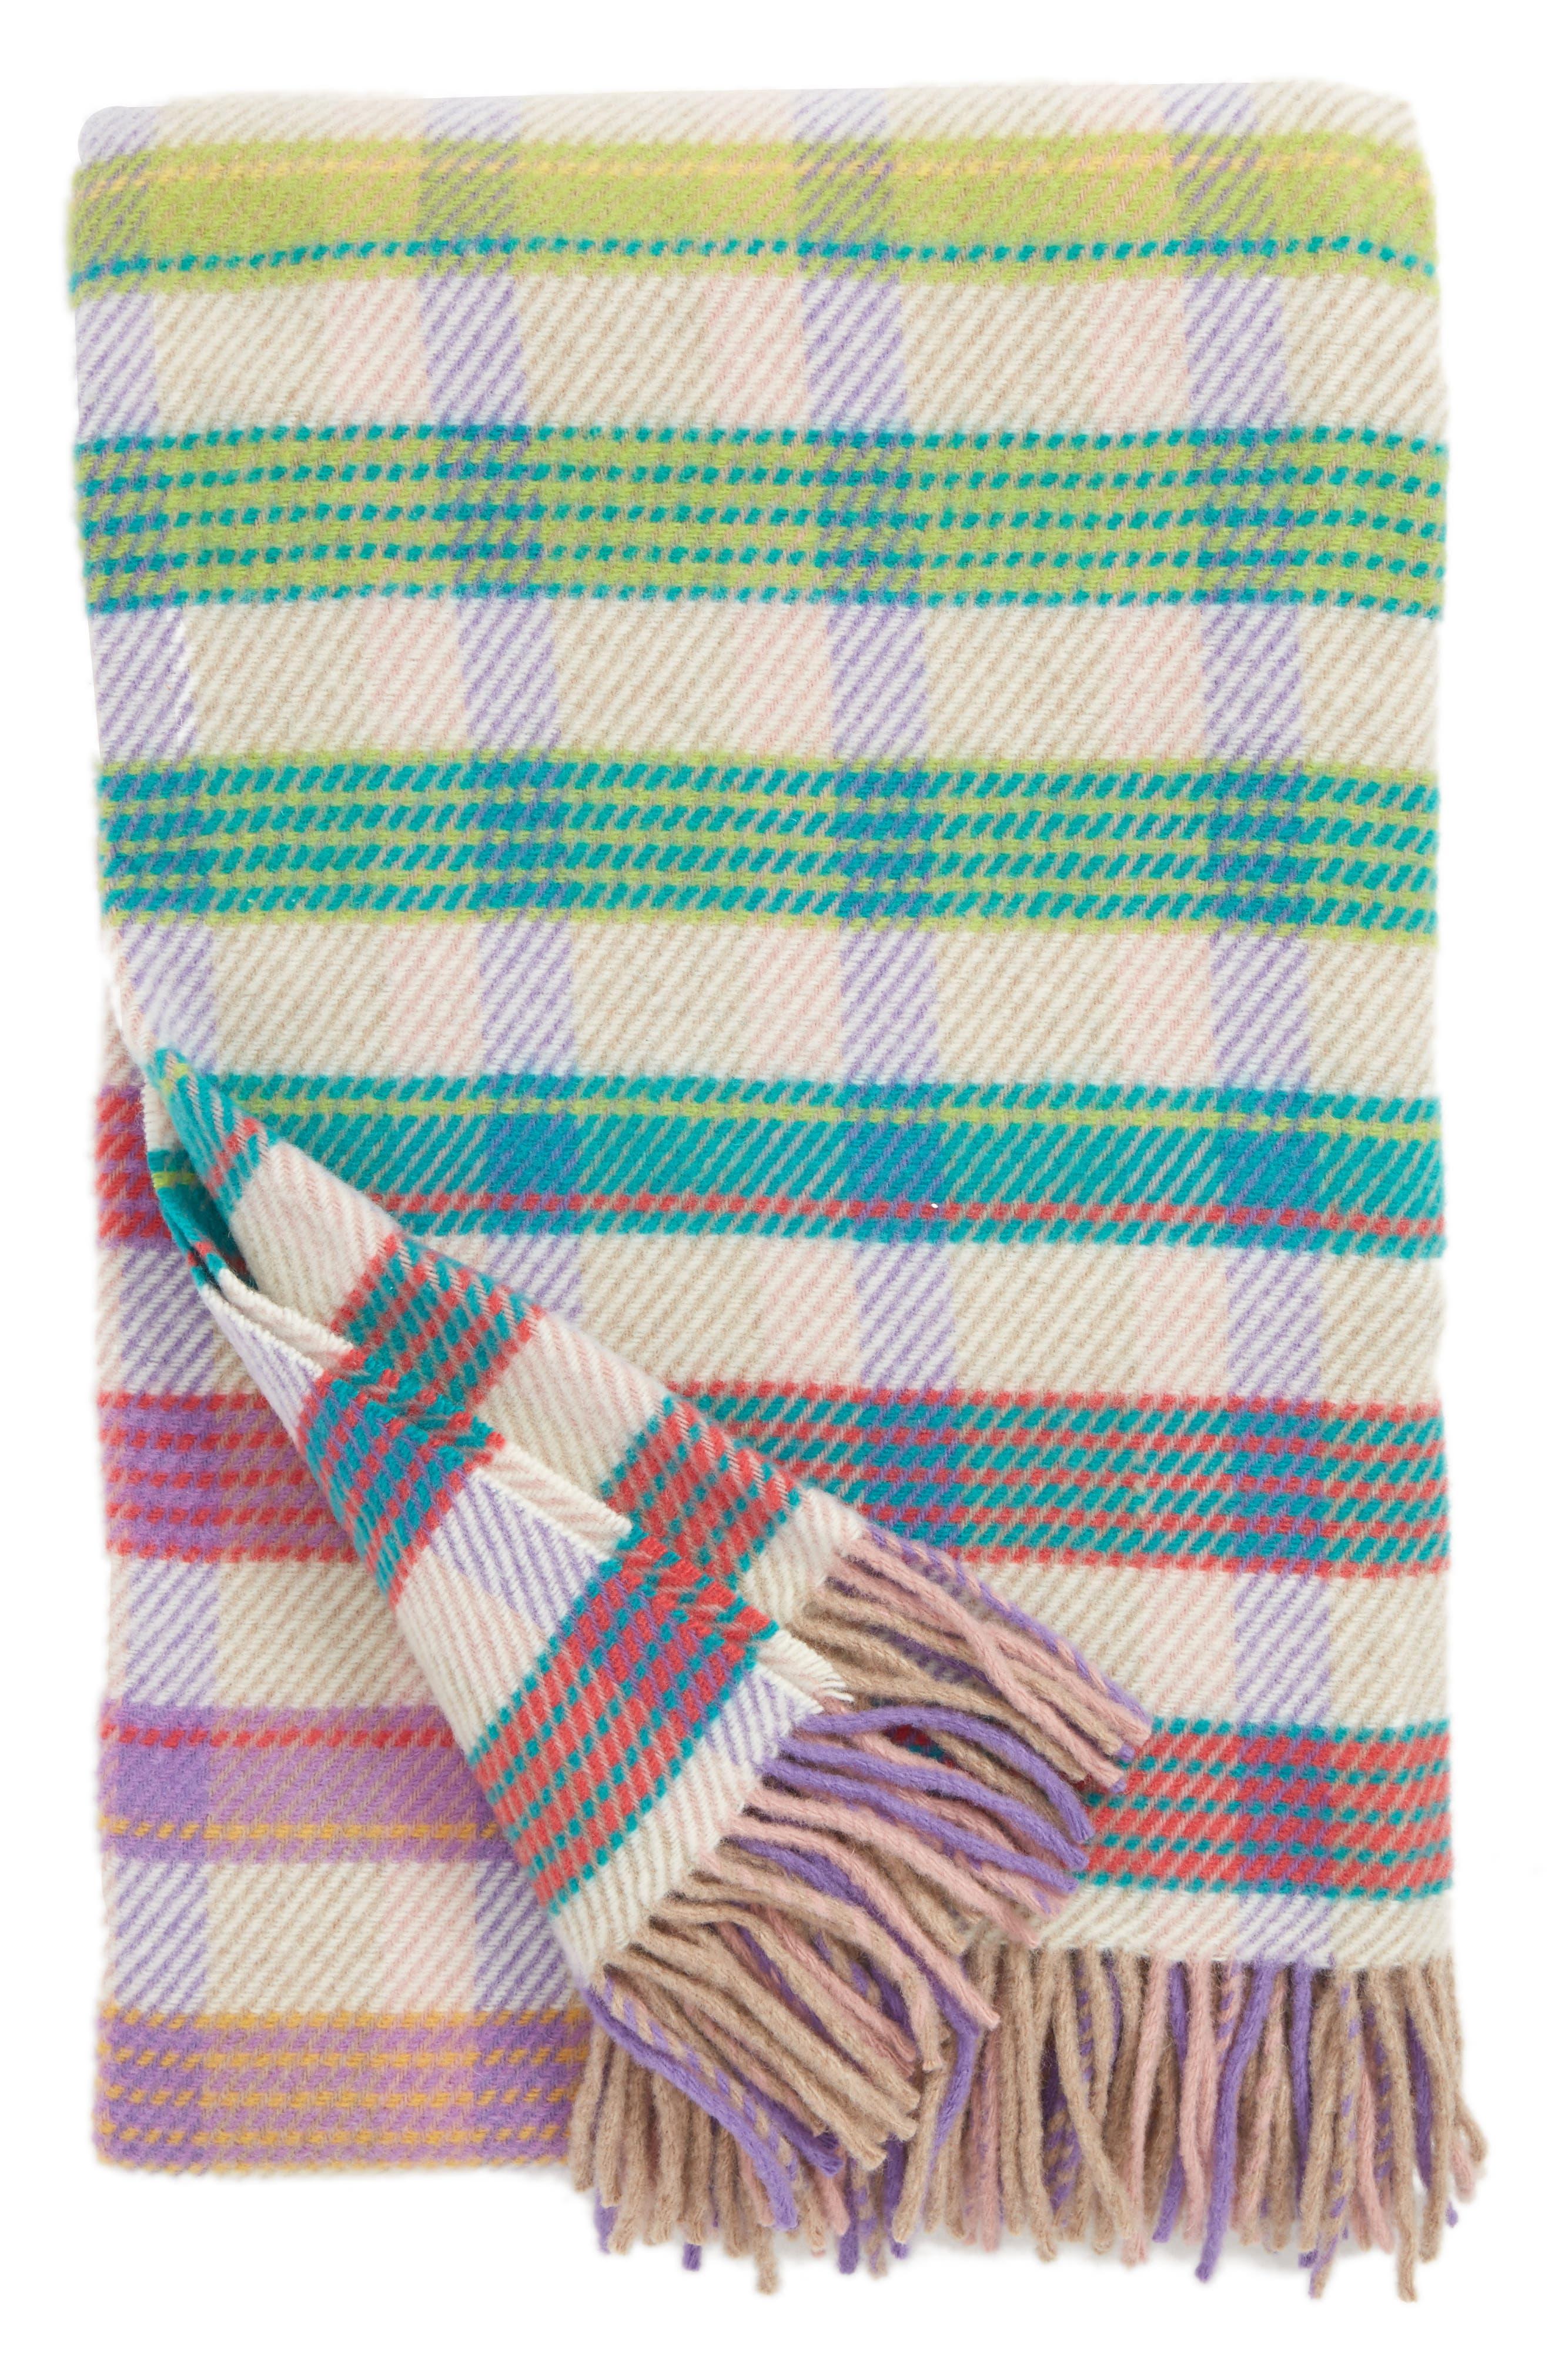 Alternate Image 1 Selected - Missoni Tiziano Wool Throw Blanket